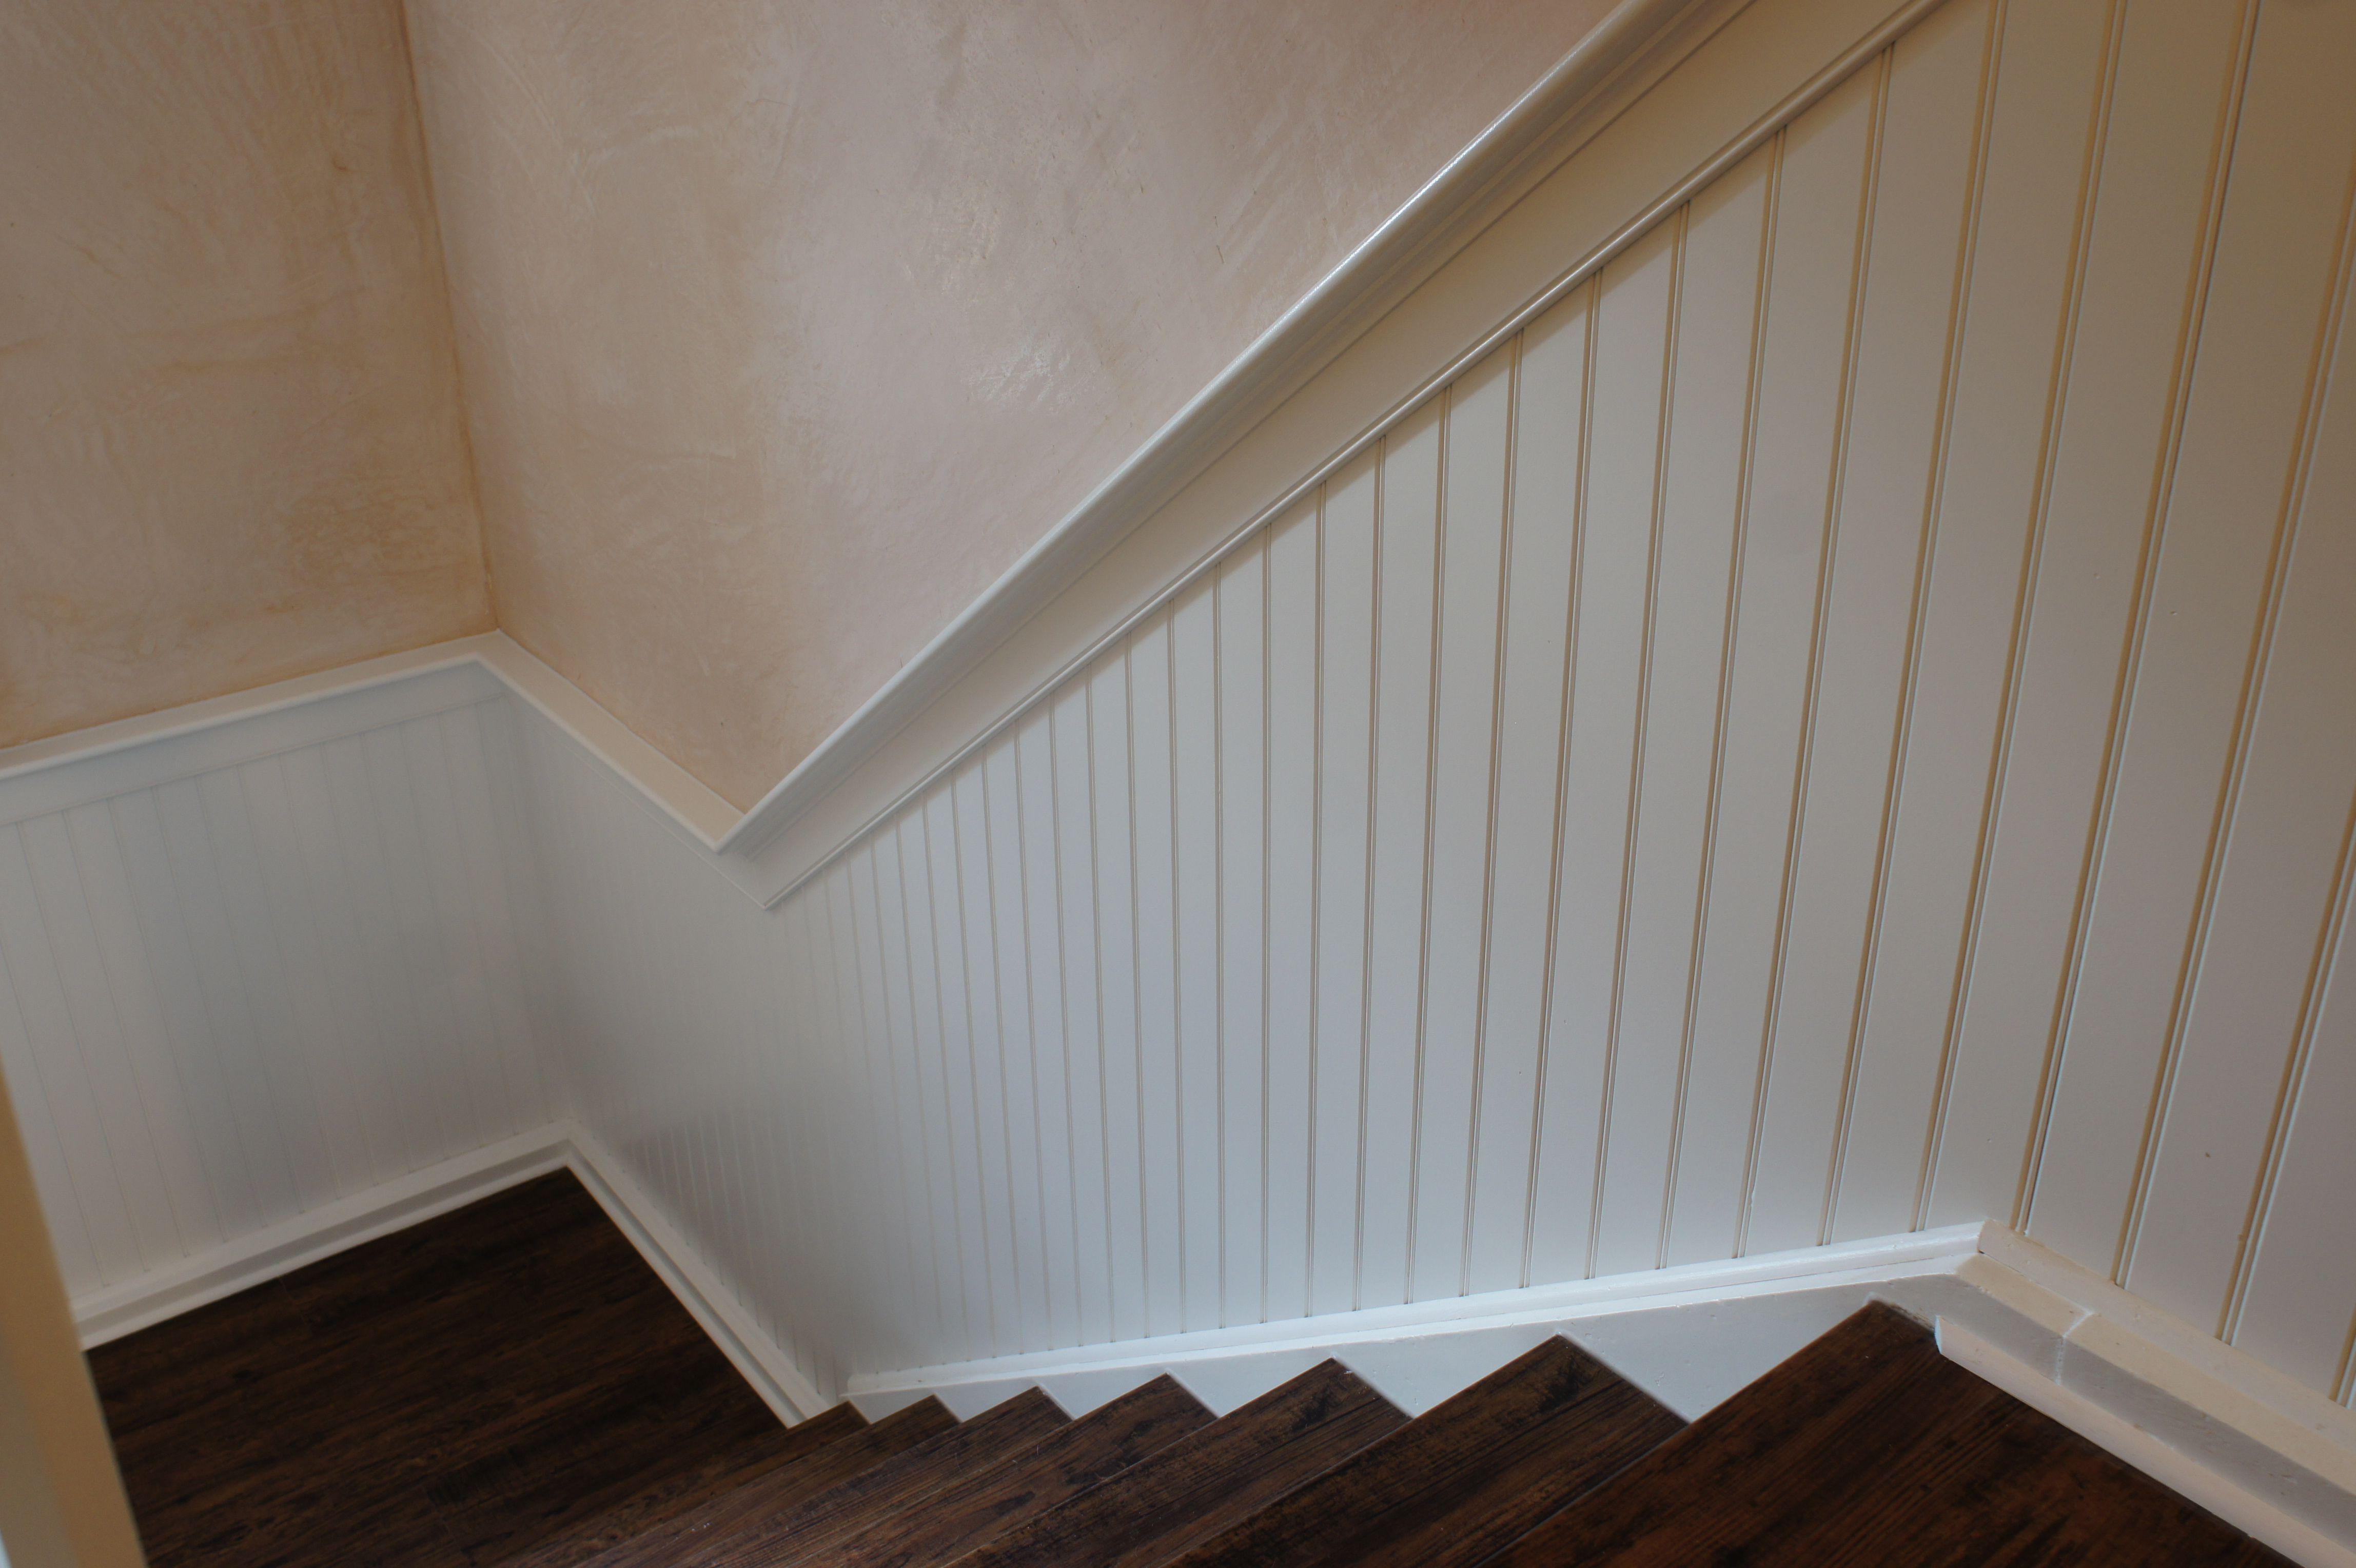 Wand Aufdoppeln wandverkleidung holzpaneele treppenhaus treppenverkleidung